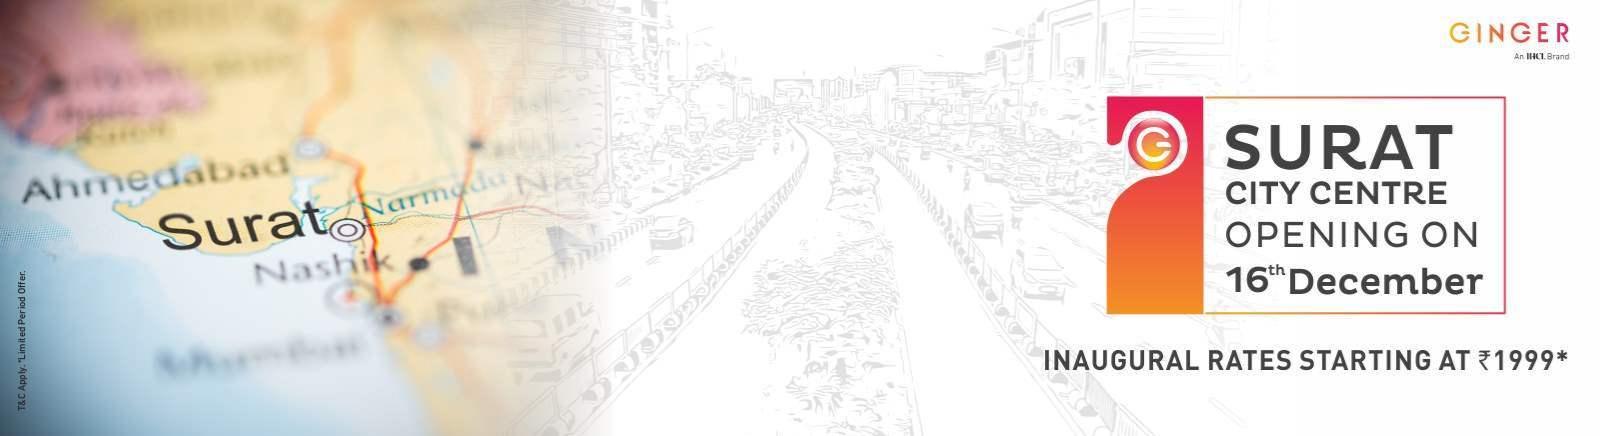 In & Around Surat City